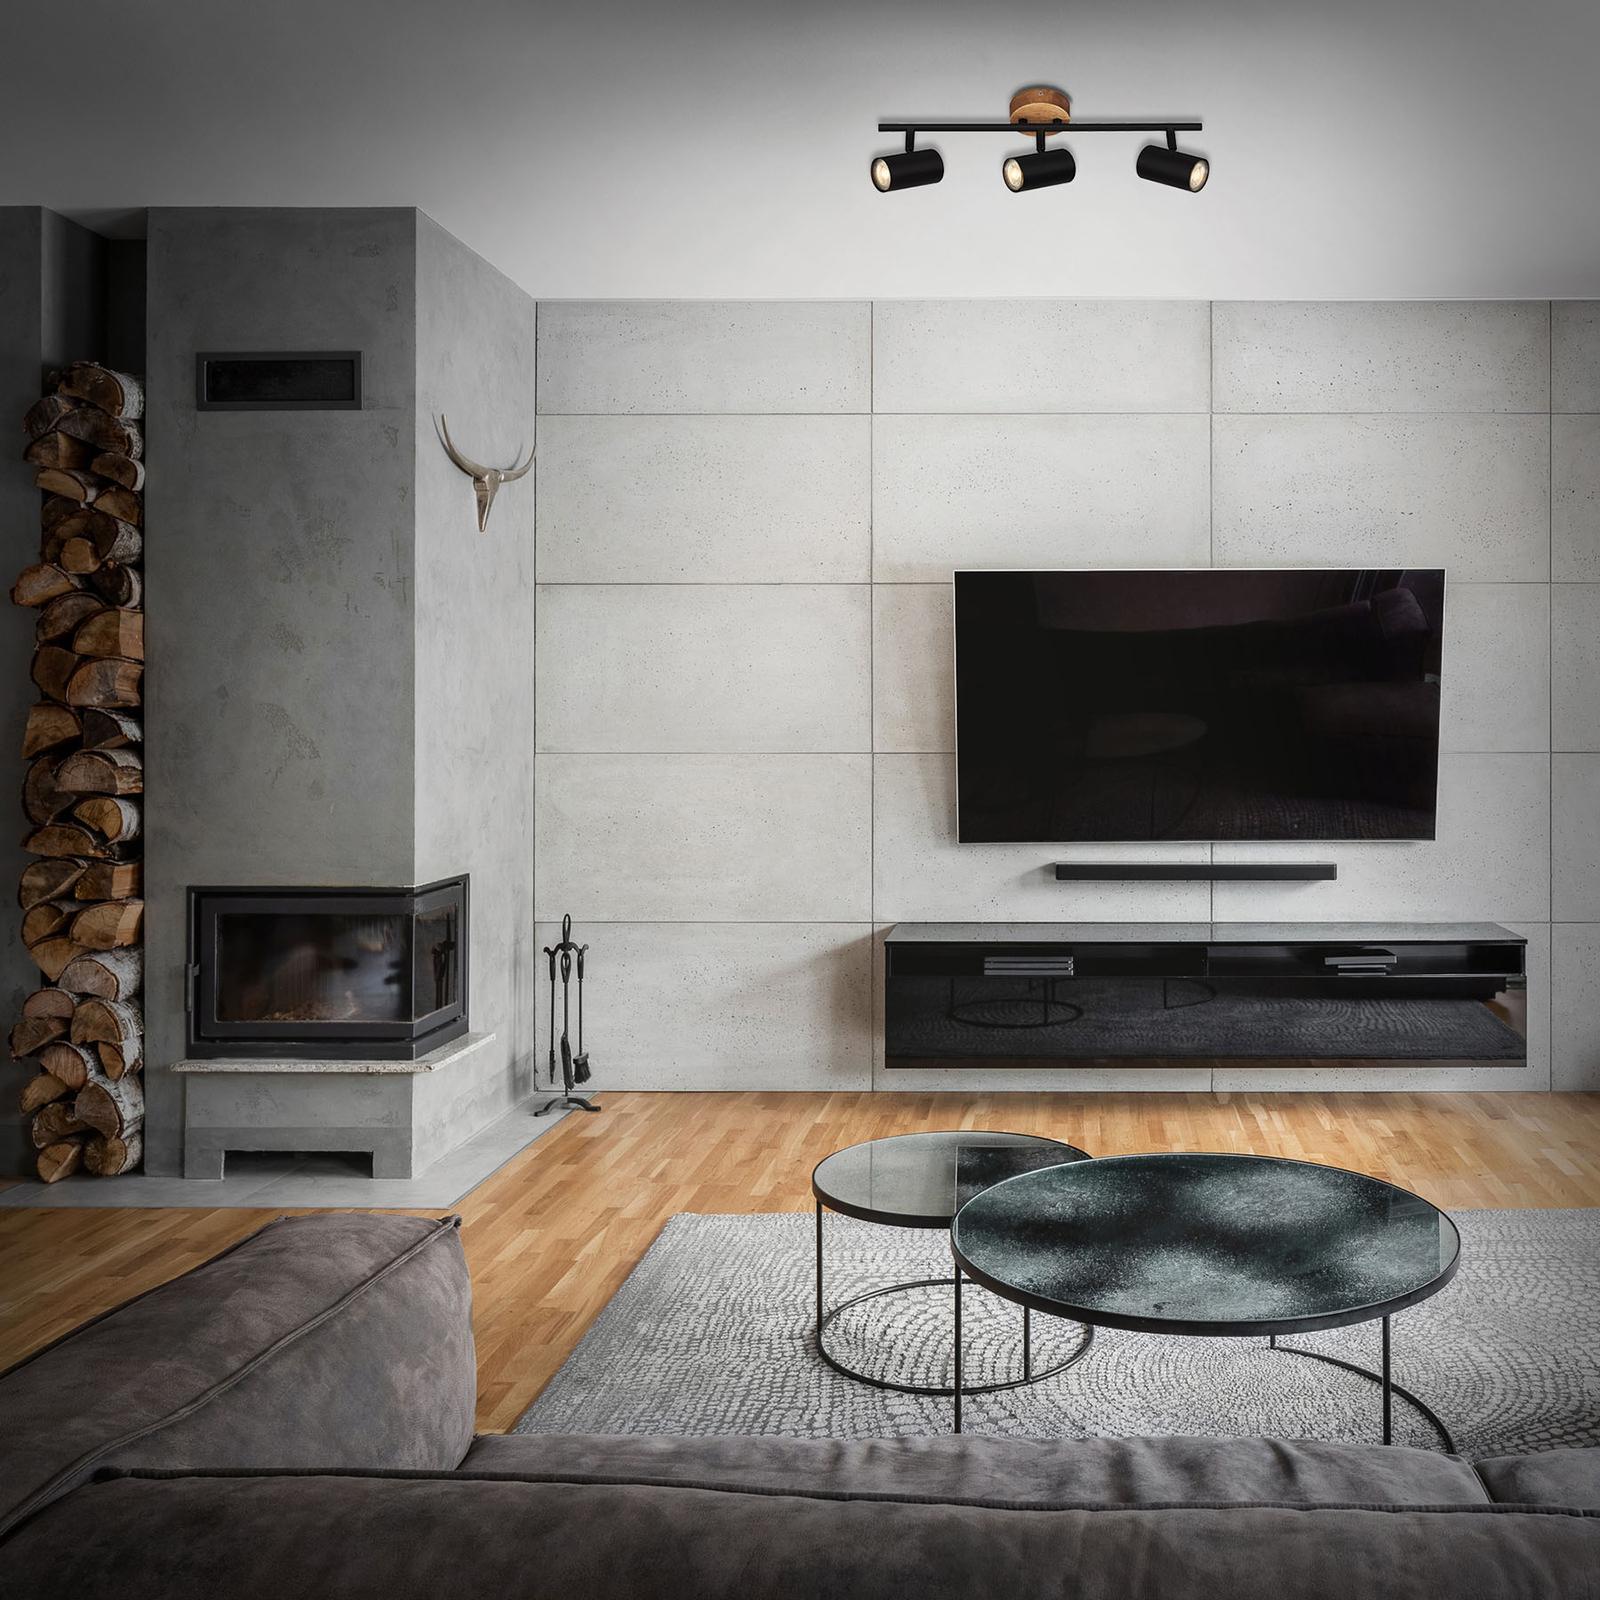 Wood & Style 2920 Deckenstrahler, dreiflammig